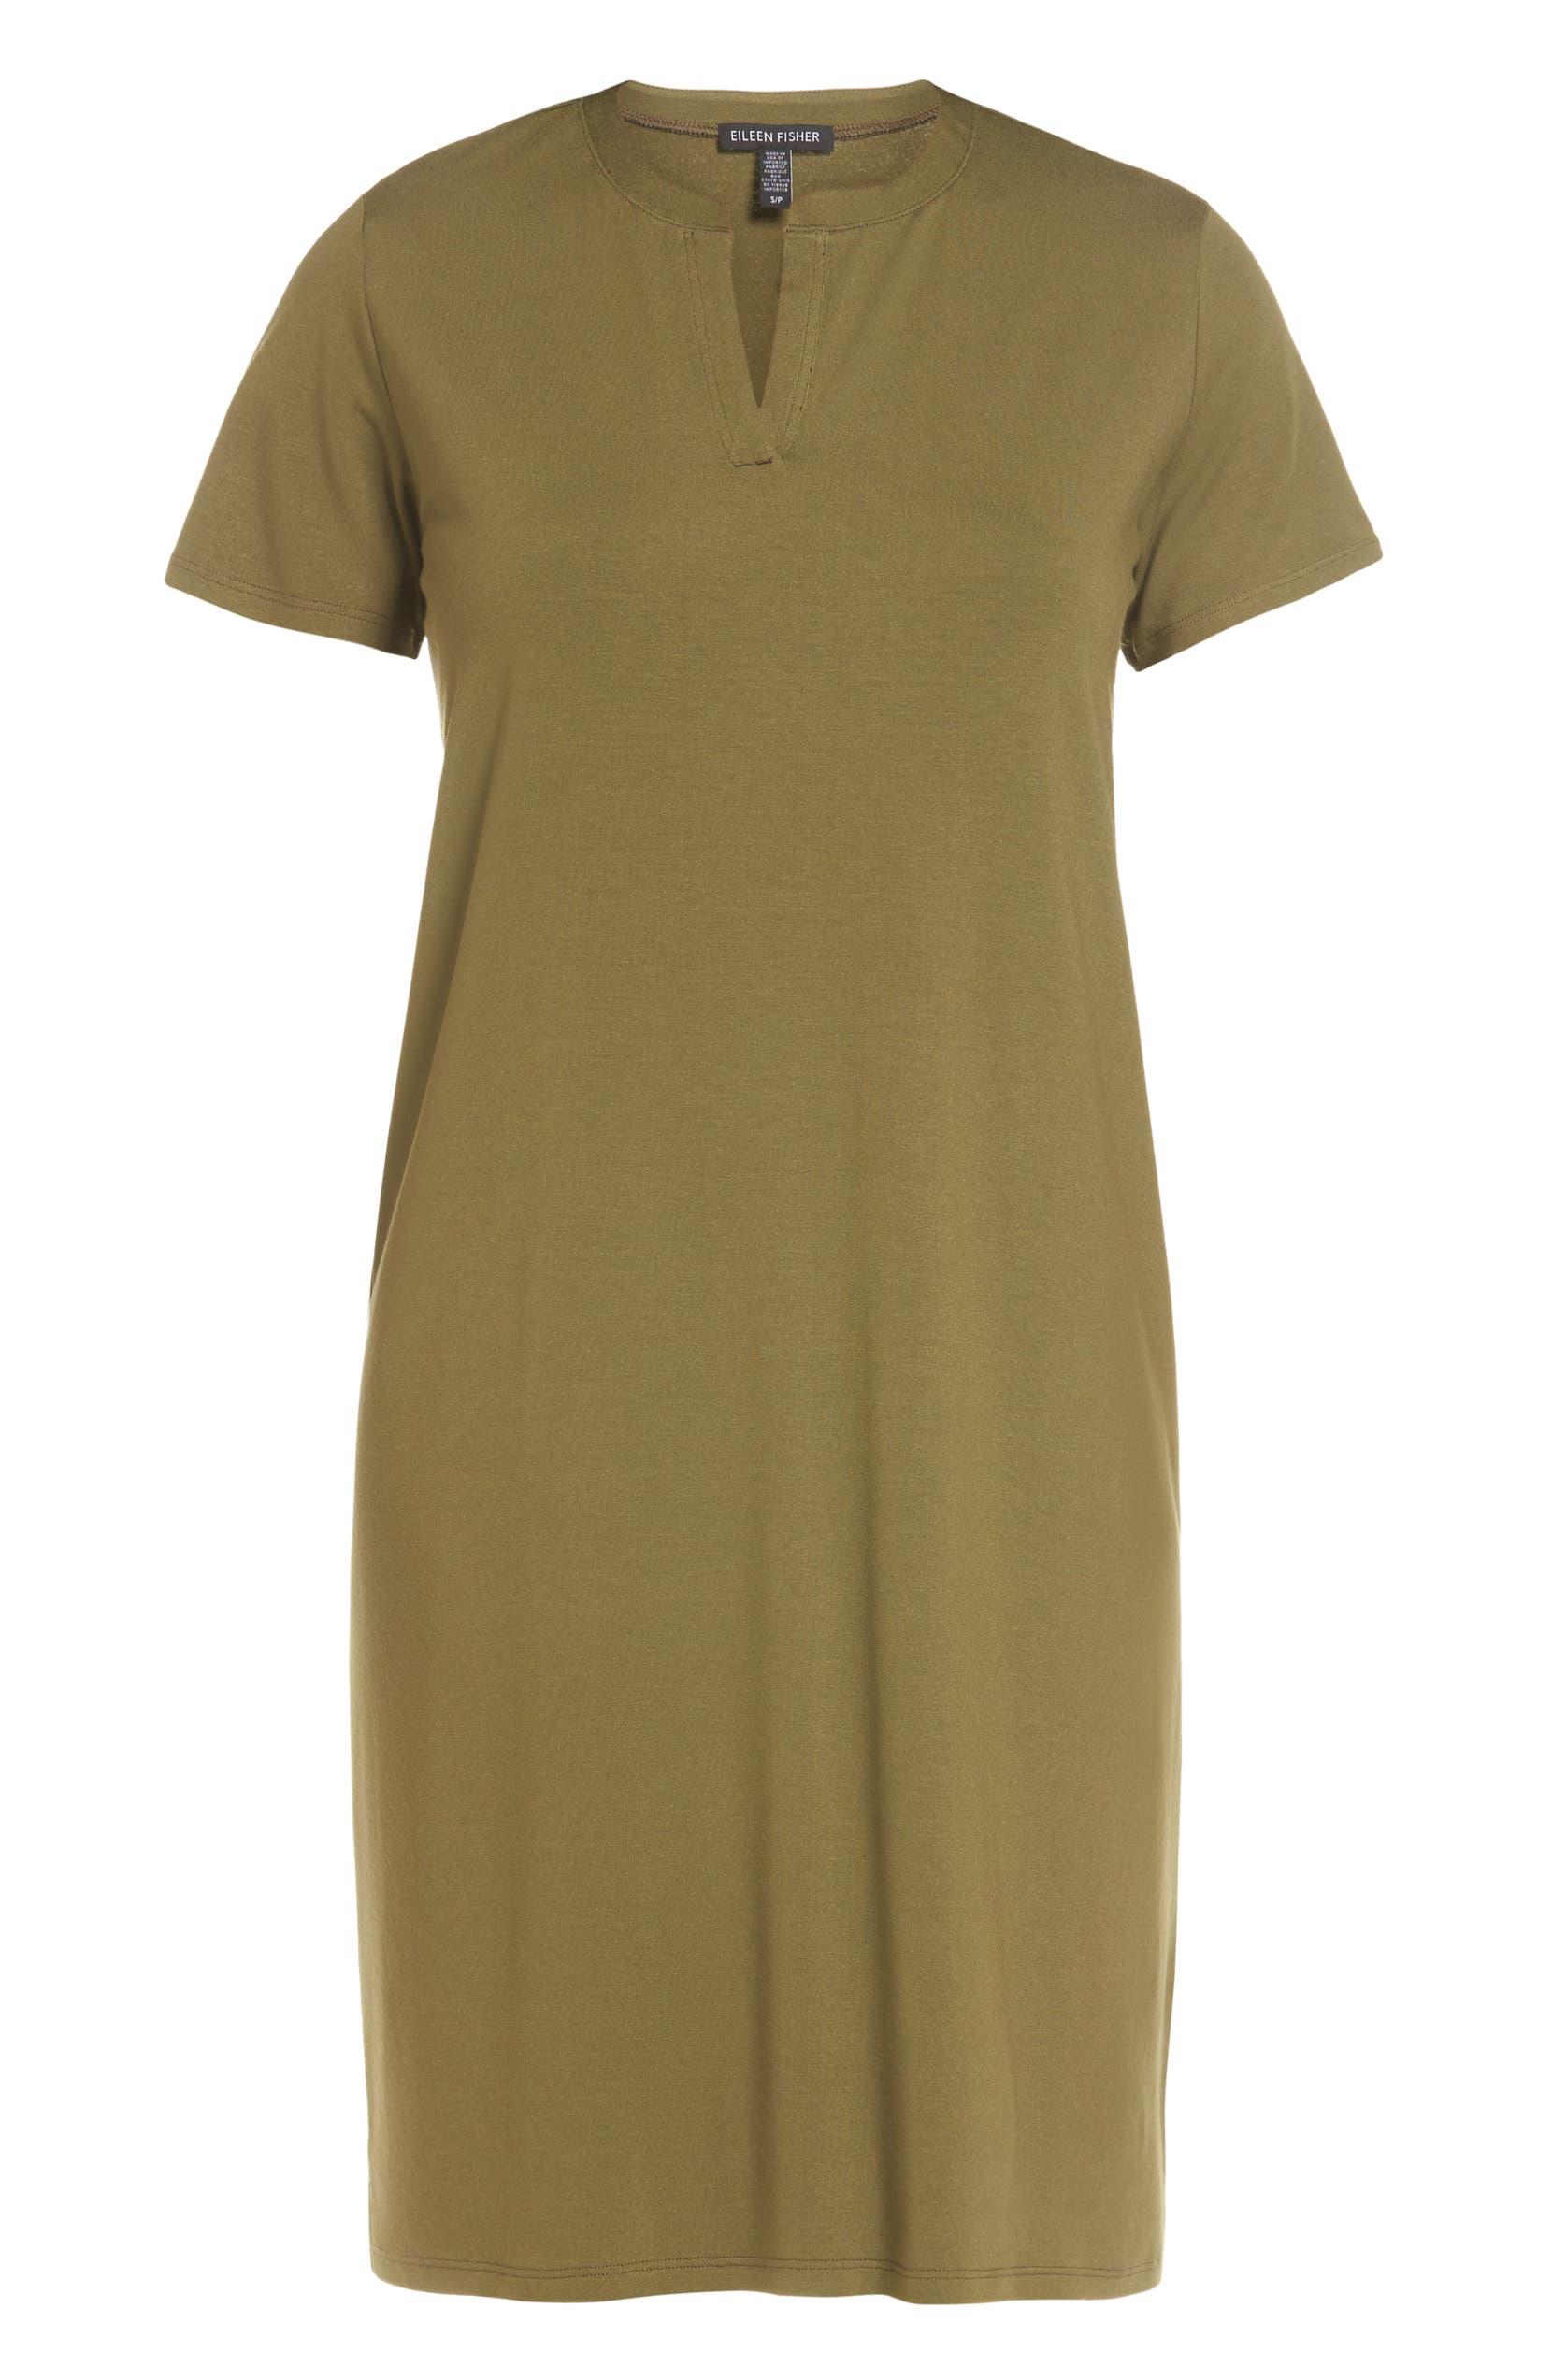 dd475854f7ca Eileen Fisher Mandarin Collar T-Shirt Dress (Regular & Petite) (Nordstrom  Exclusive) | Nordstrom